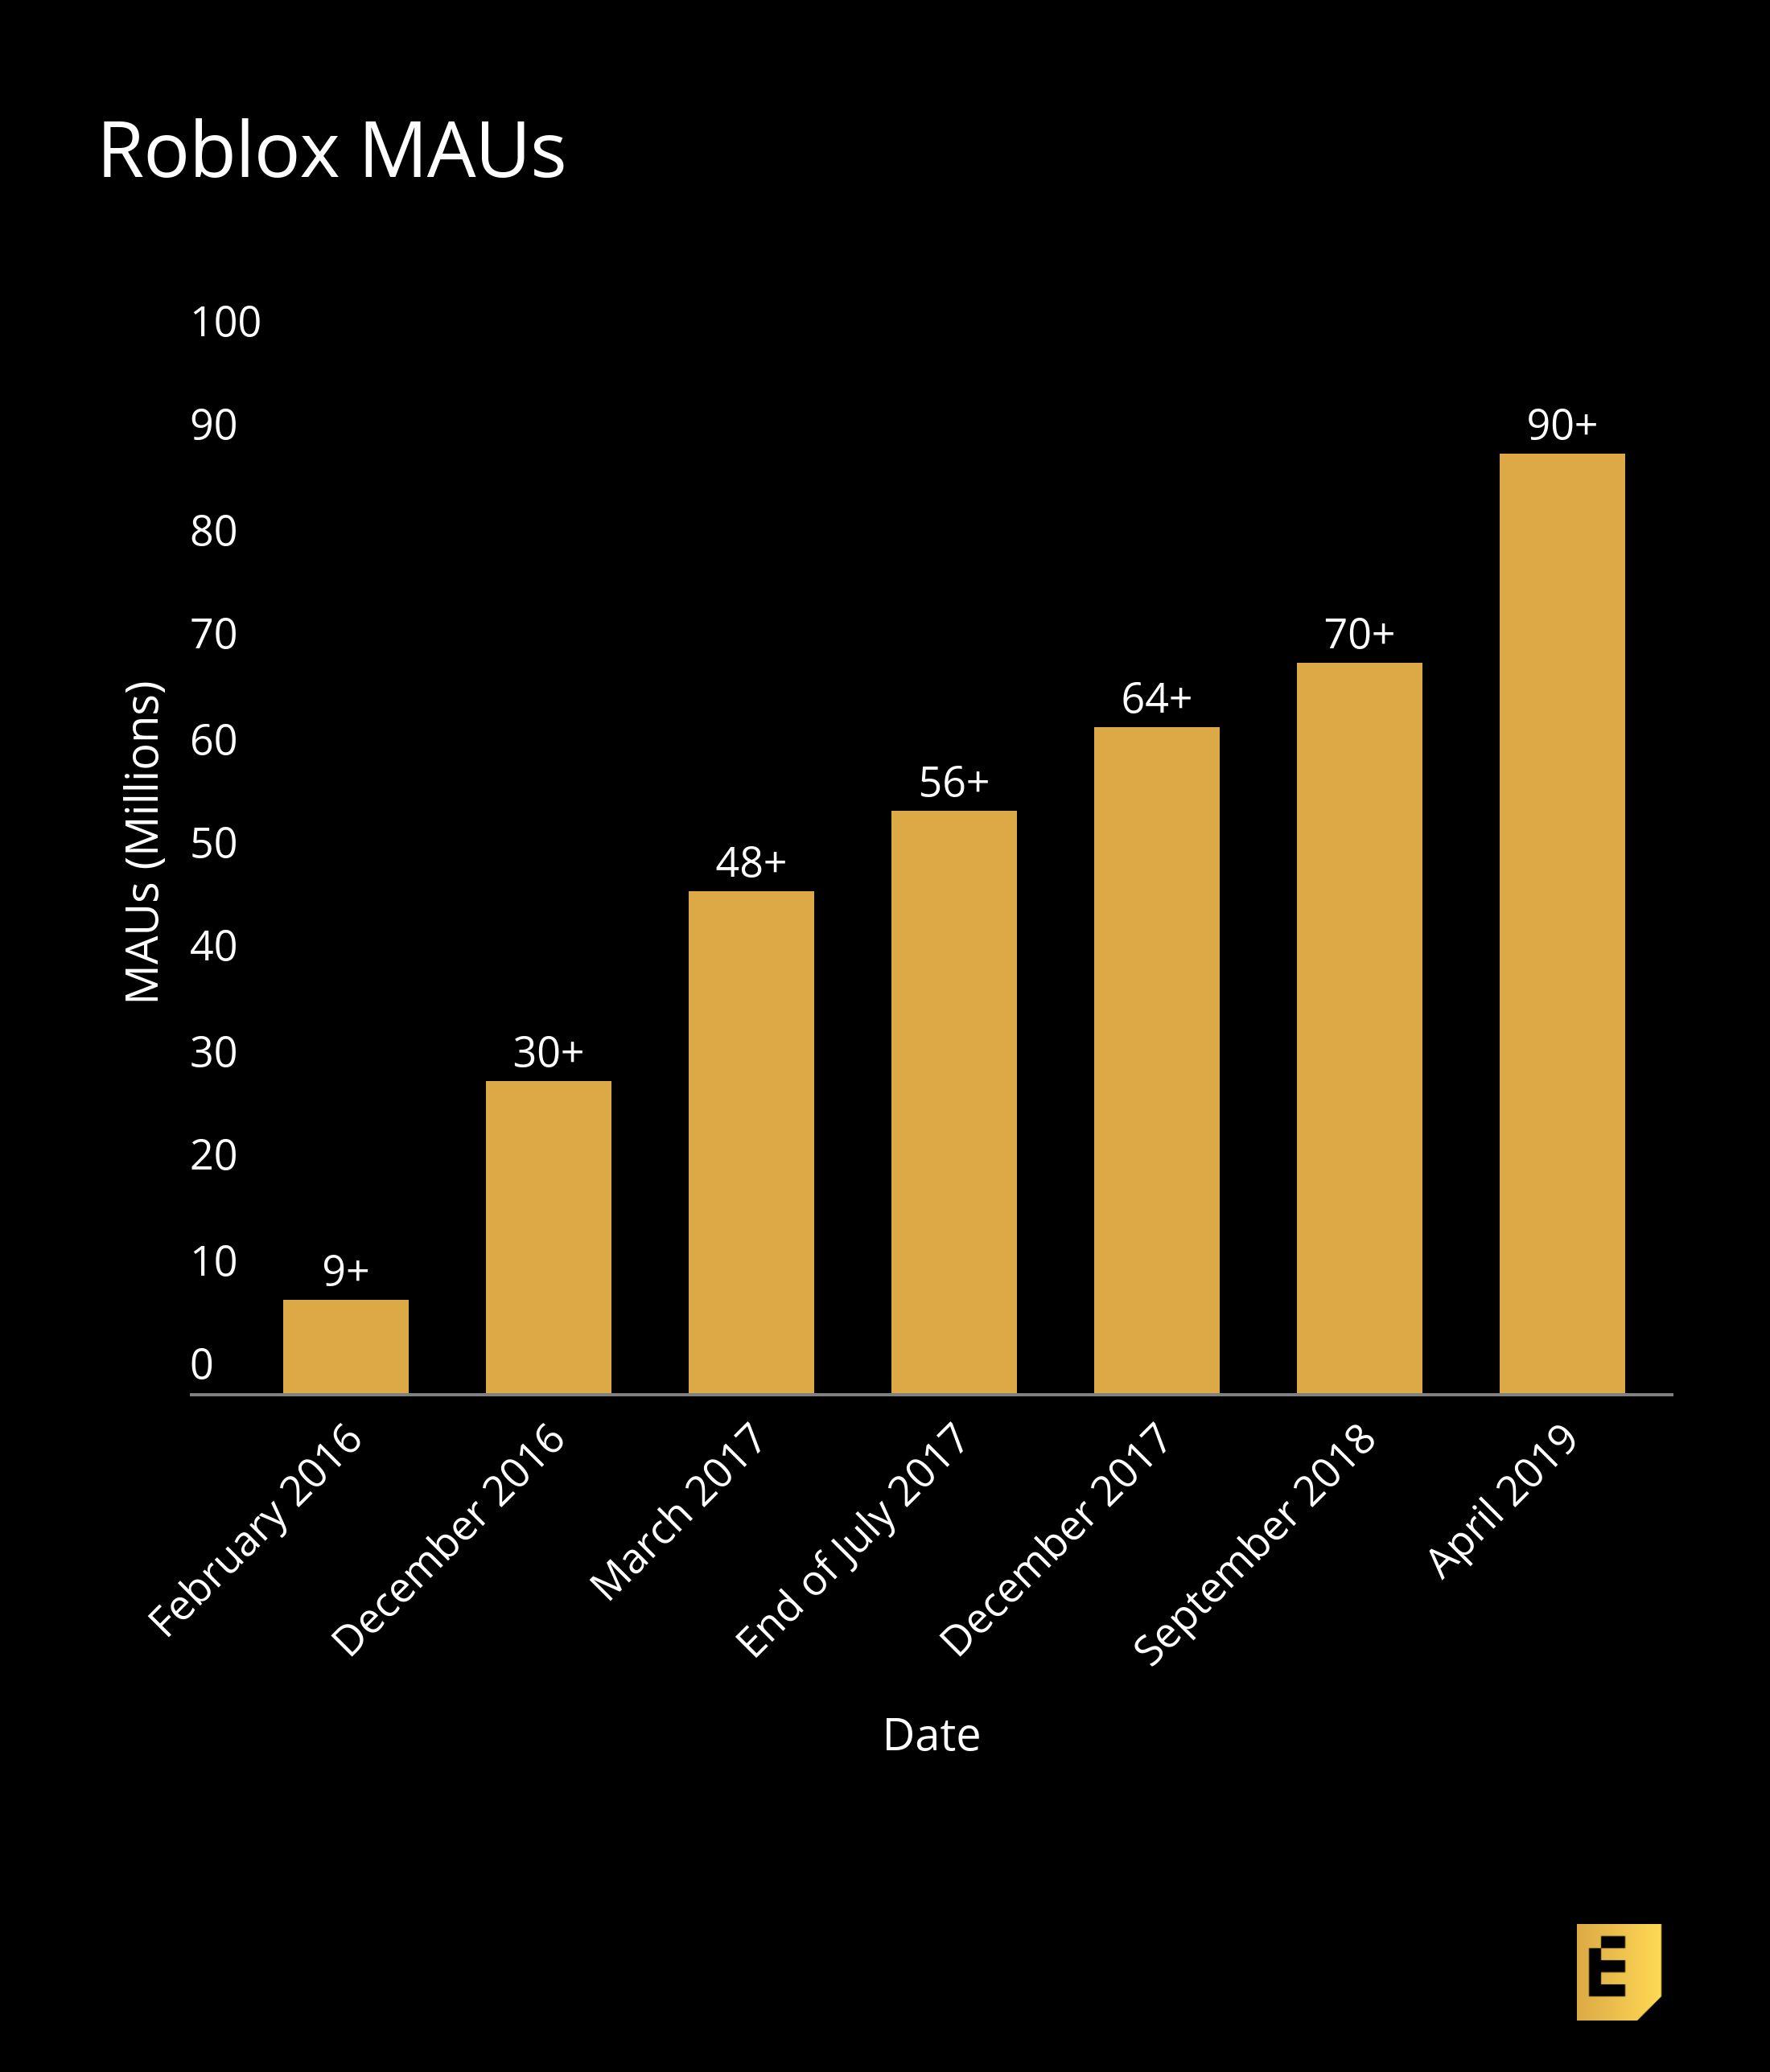 Roblox Llega A Los 100 Millones De Usuarios Mensuales Roblox Alcanza Los 100 Millones De Usuarios Activos Mensuales La Neta Neta